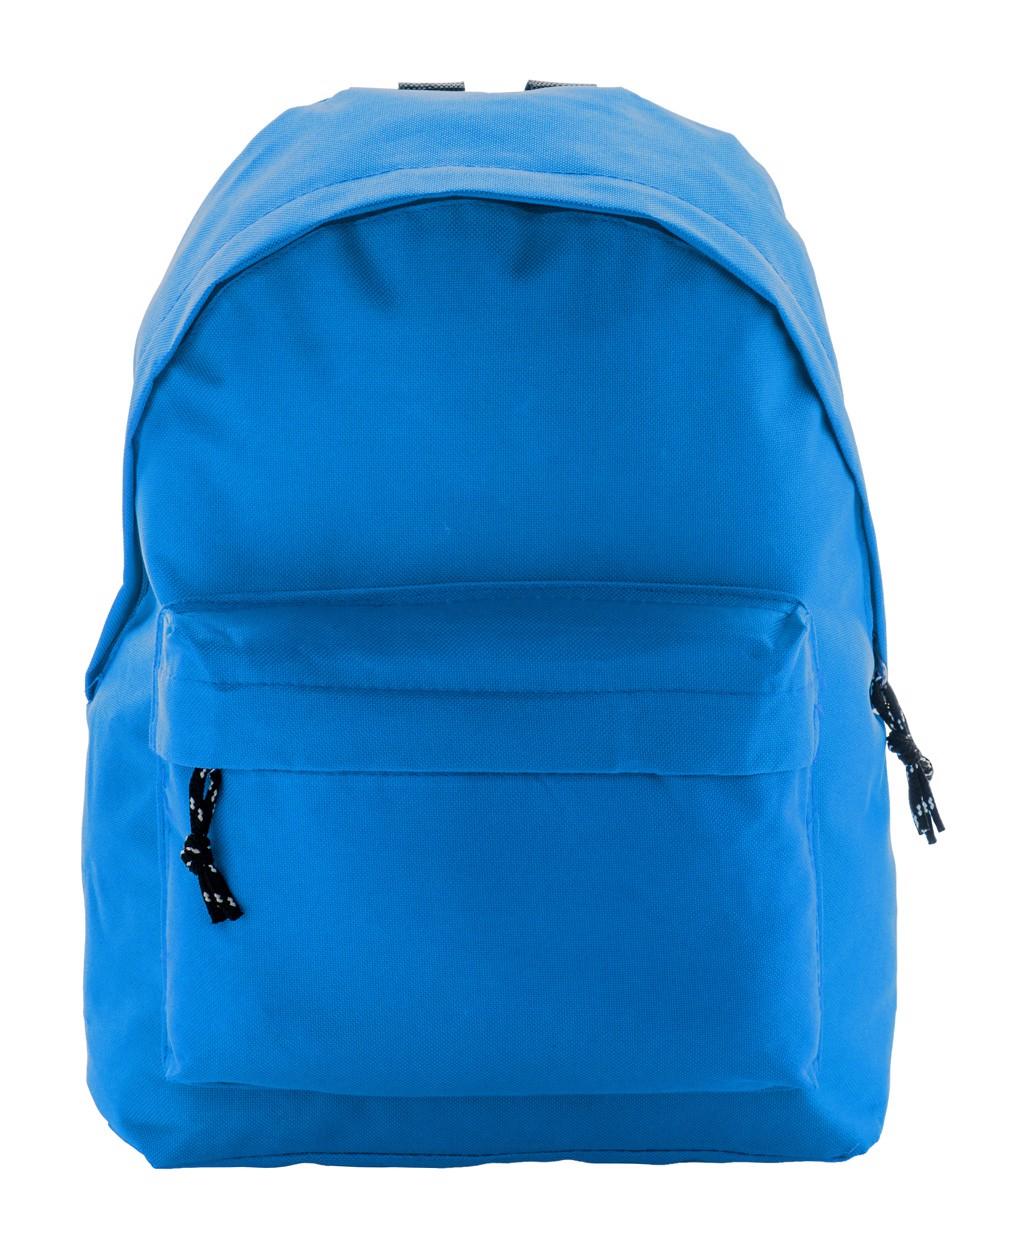 Batoh Discovery - Modrá